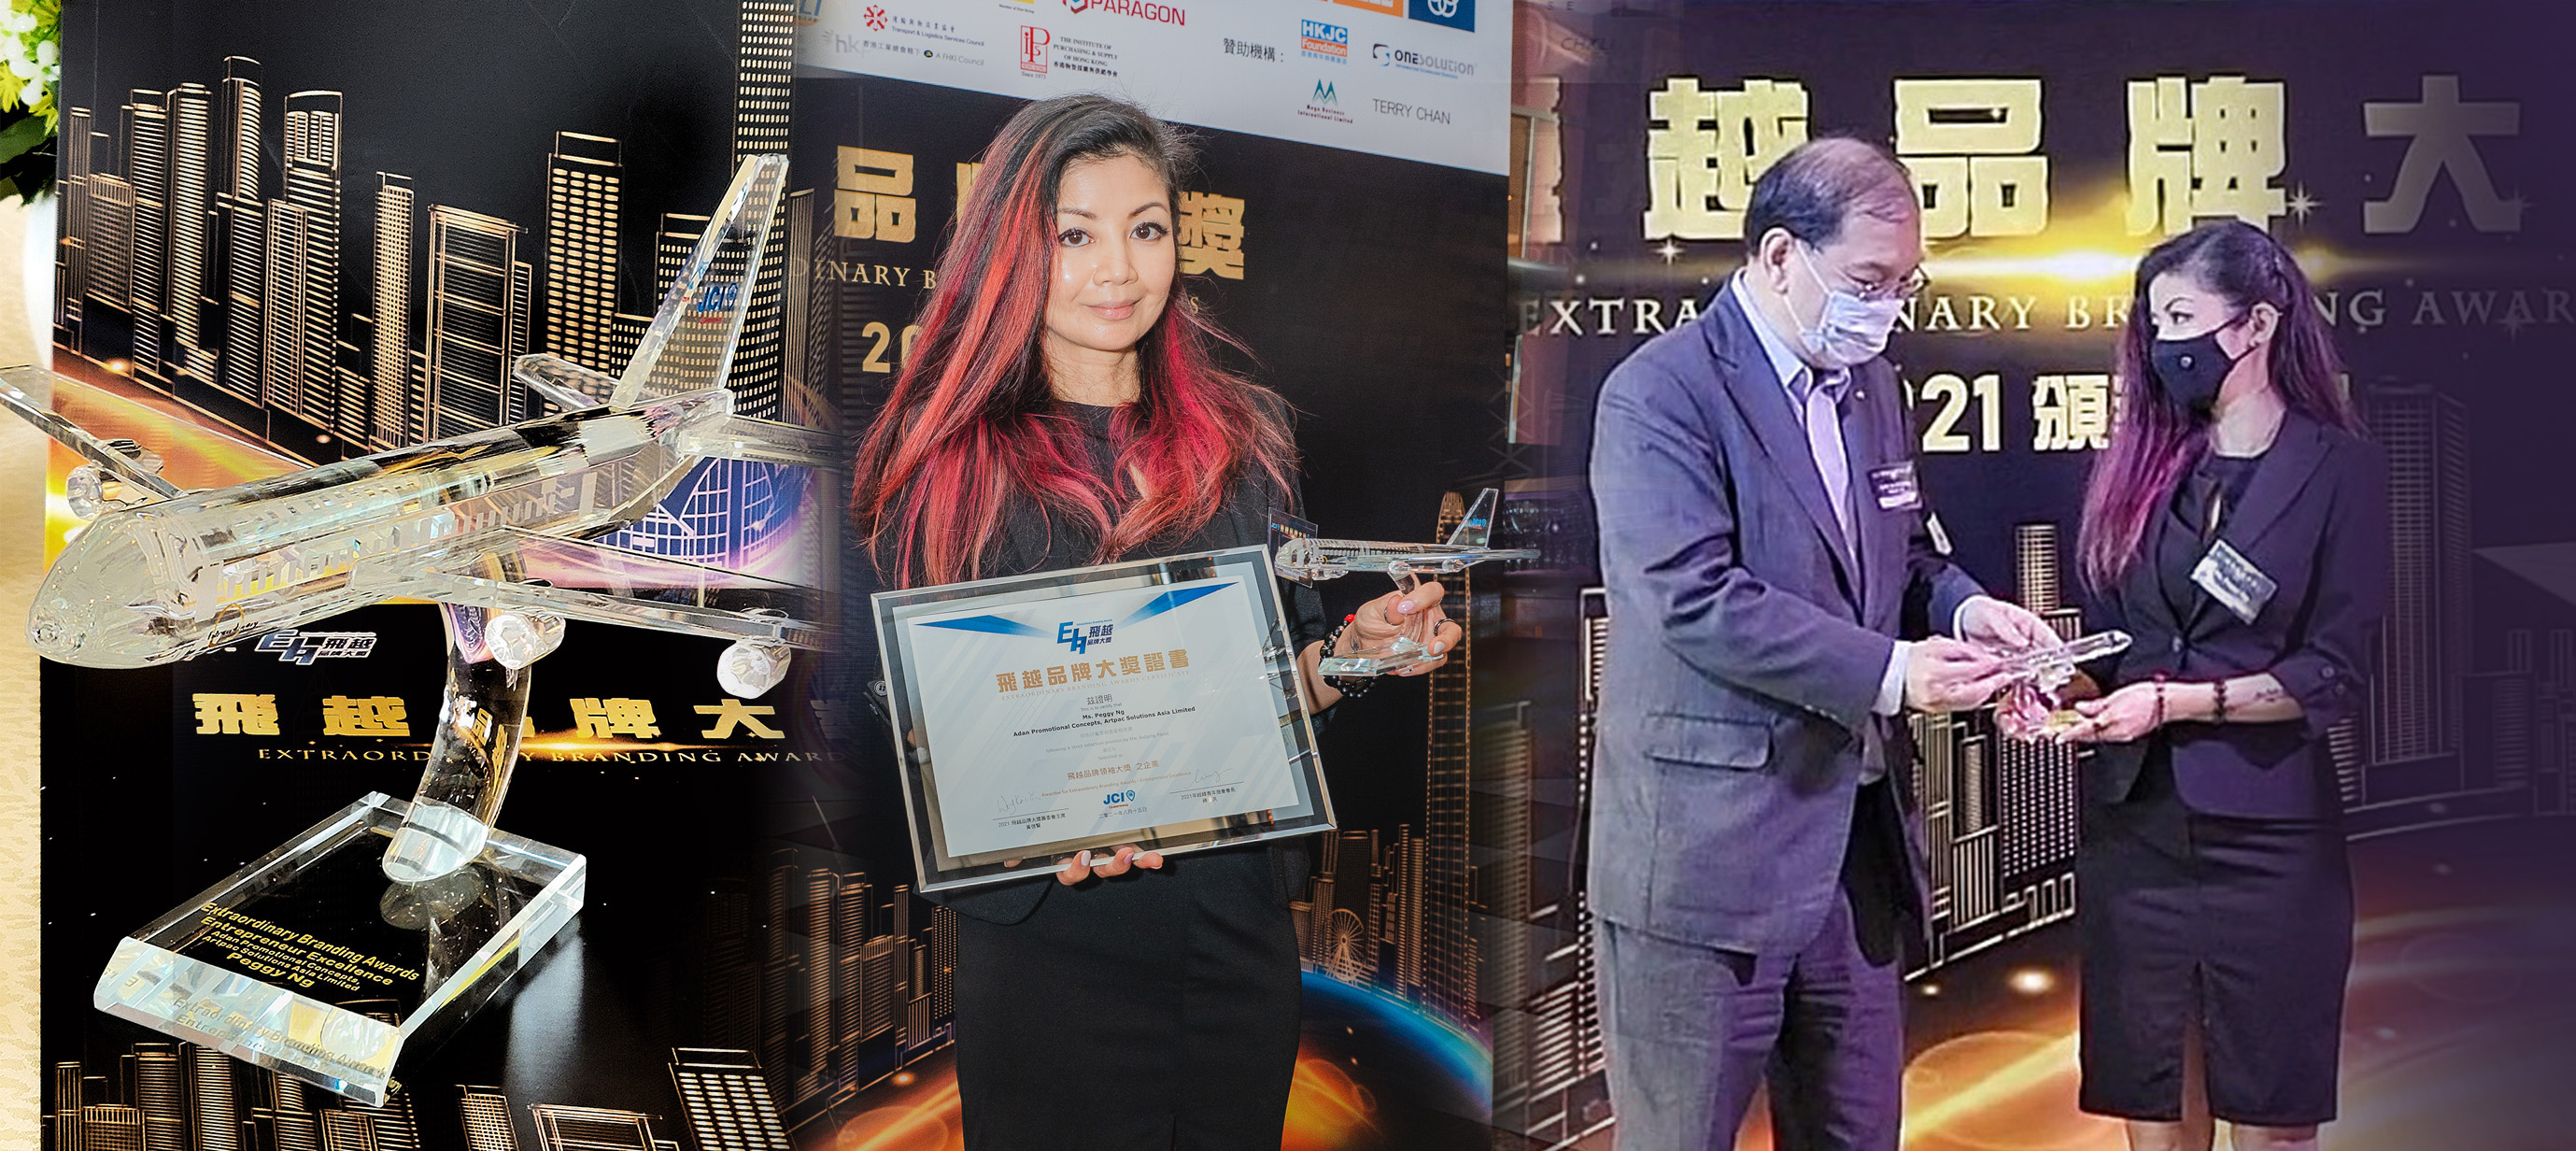 Extraordinary Branding Award 2021